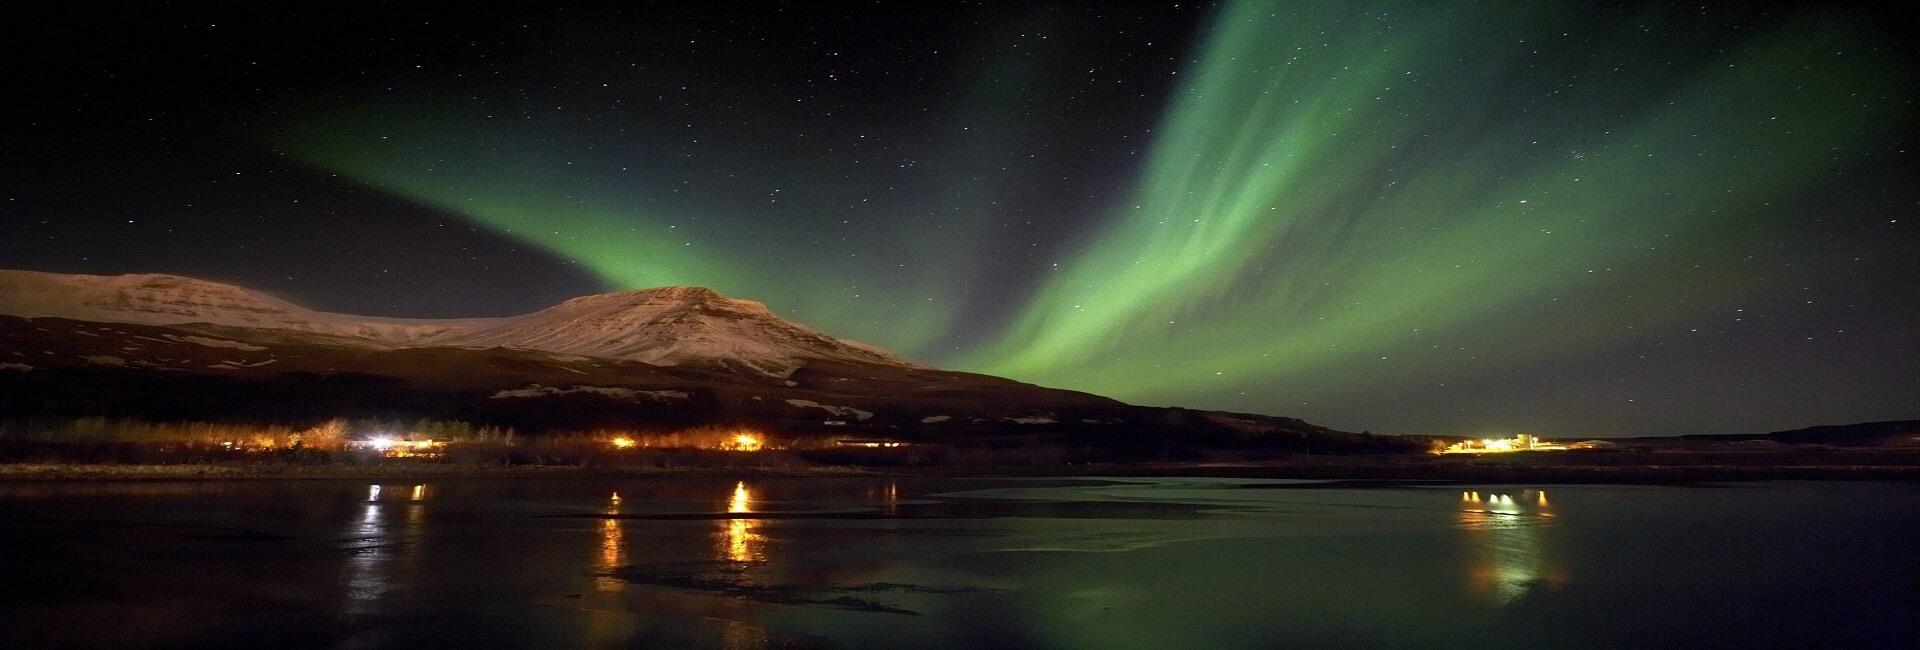 Iceland Explorer Self-drive